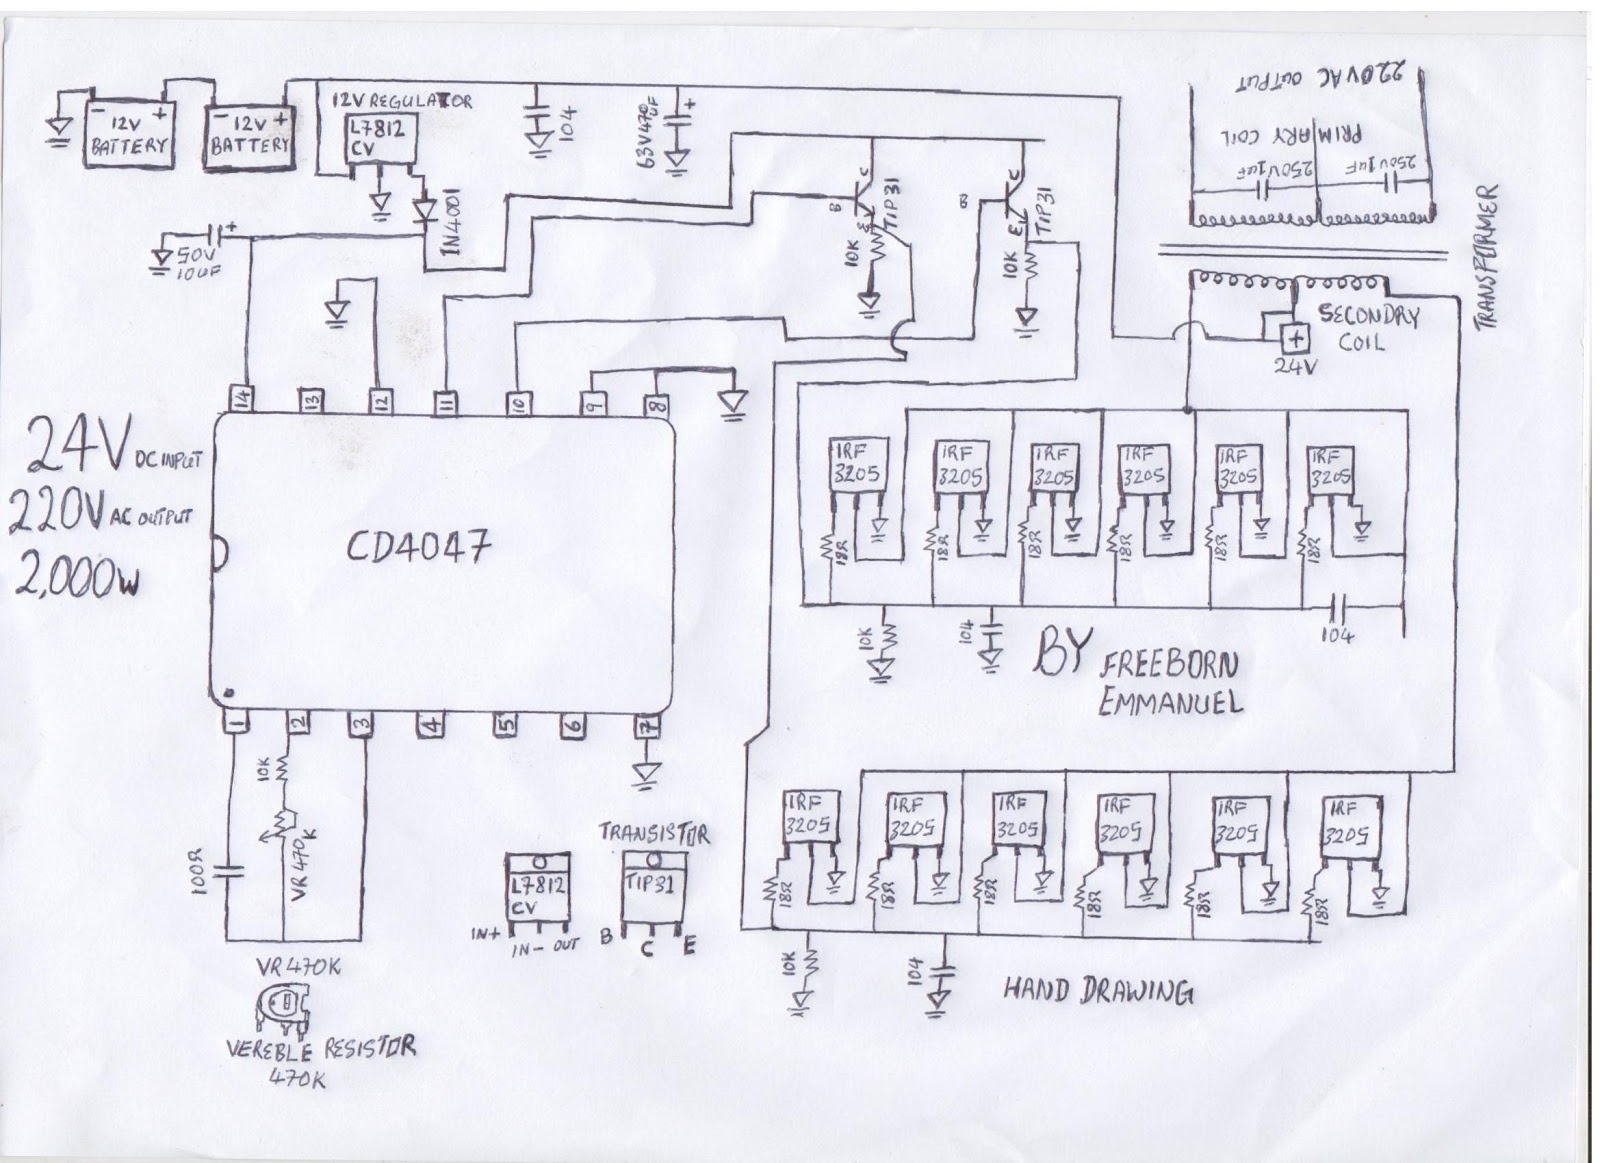 2000 watt inverter circuit diagram wiring diagram for you 2000w power inverter circuit diagram 2000w inverter wiring diagram [ 1600 x 1163 Pixel ]